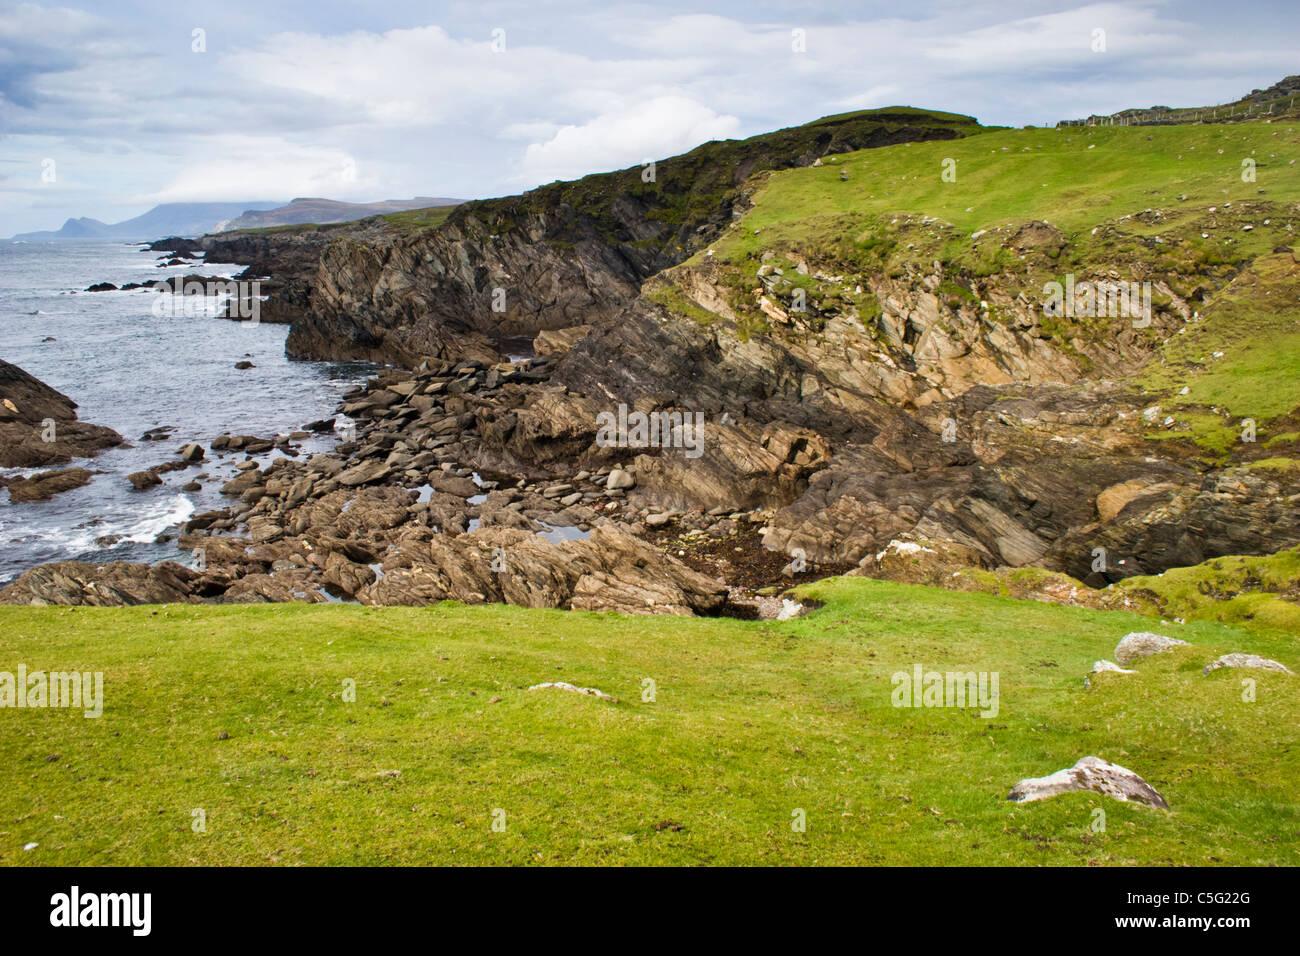 Atlantic seacoast cliffs and rocks on Achill Island off the west coast of Ireland - Stock Image